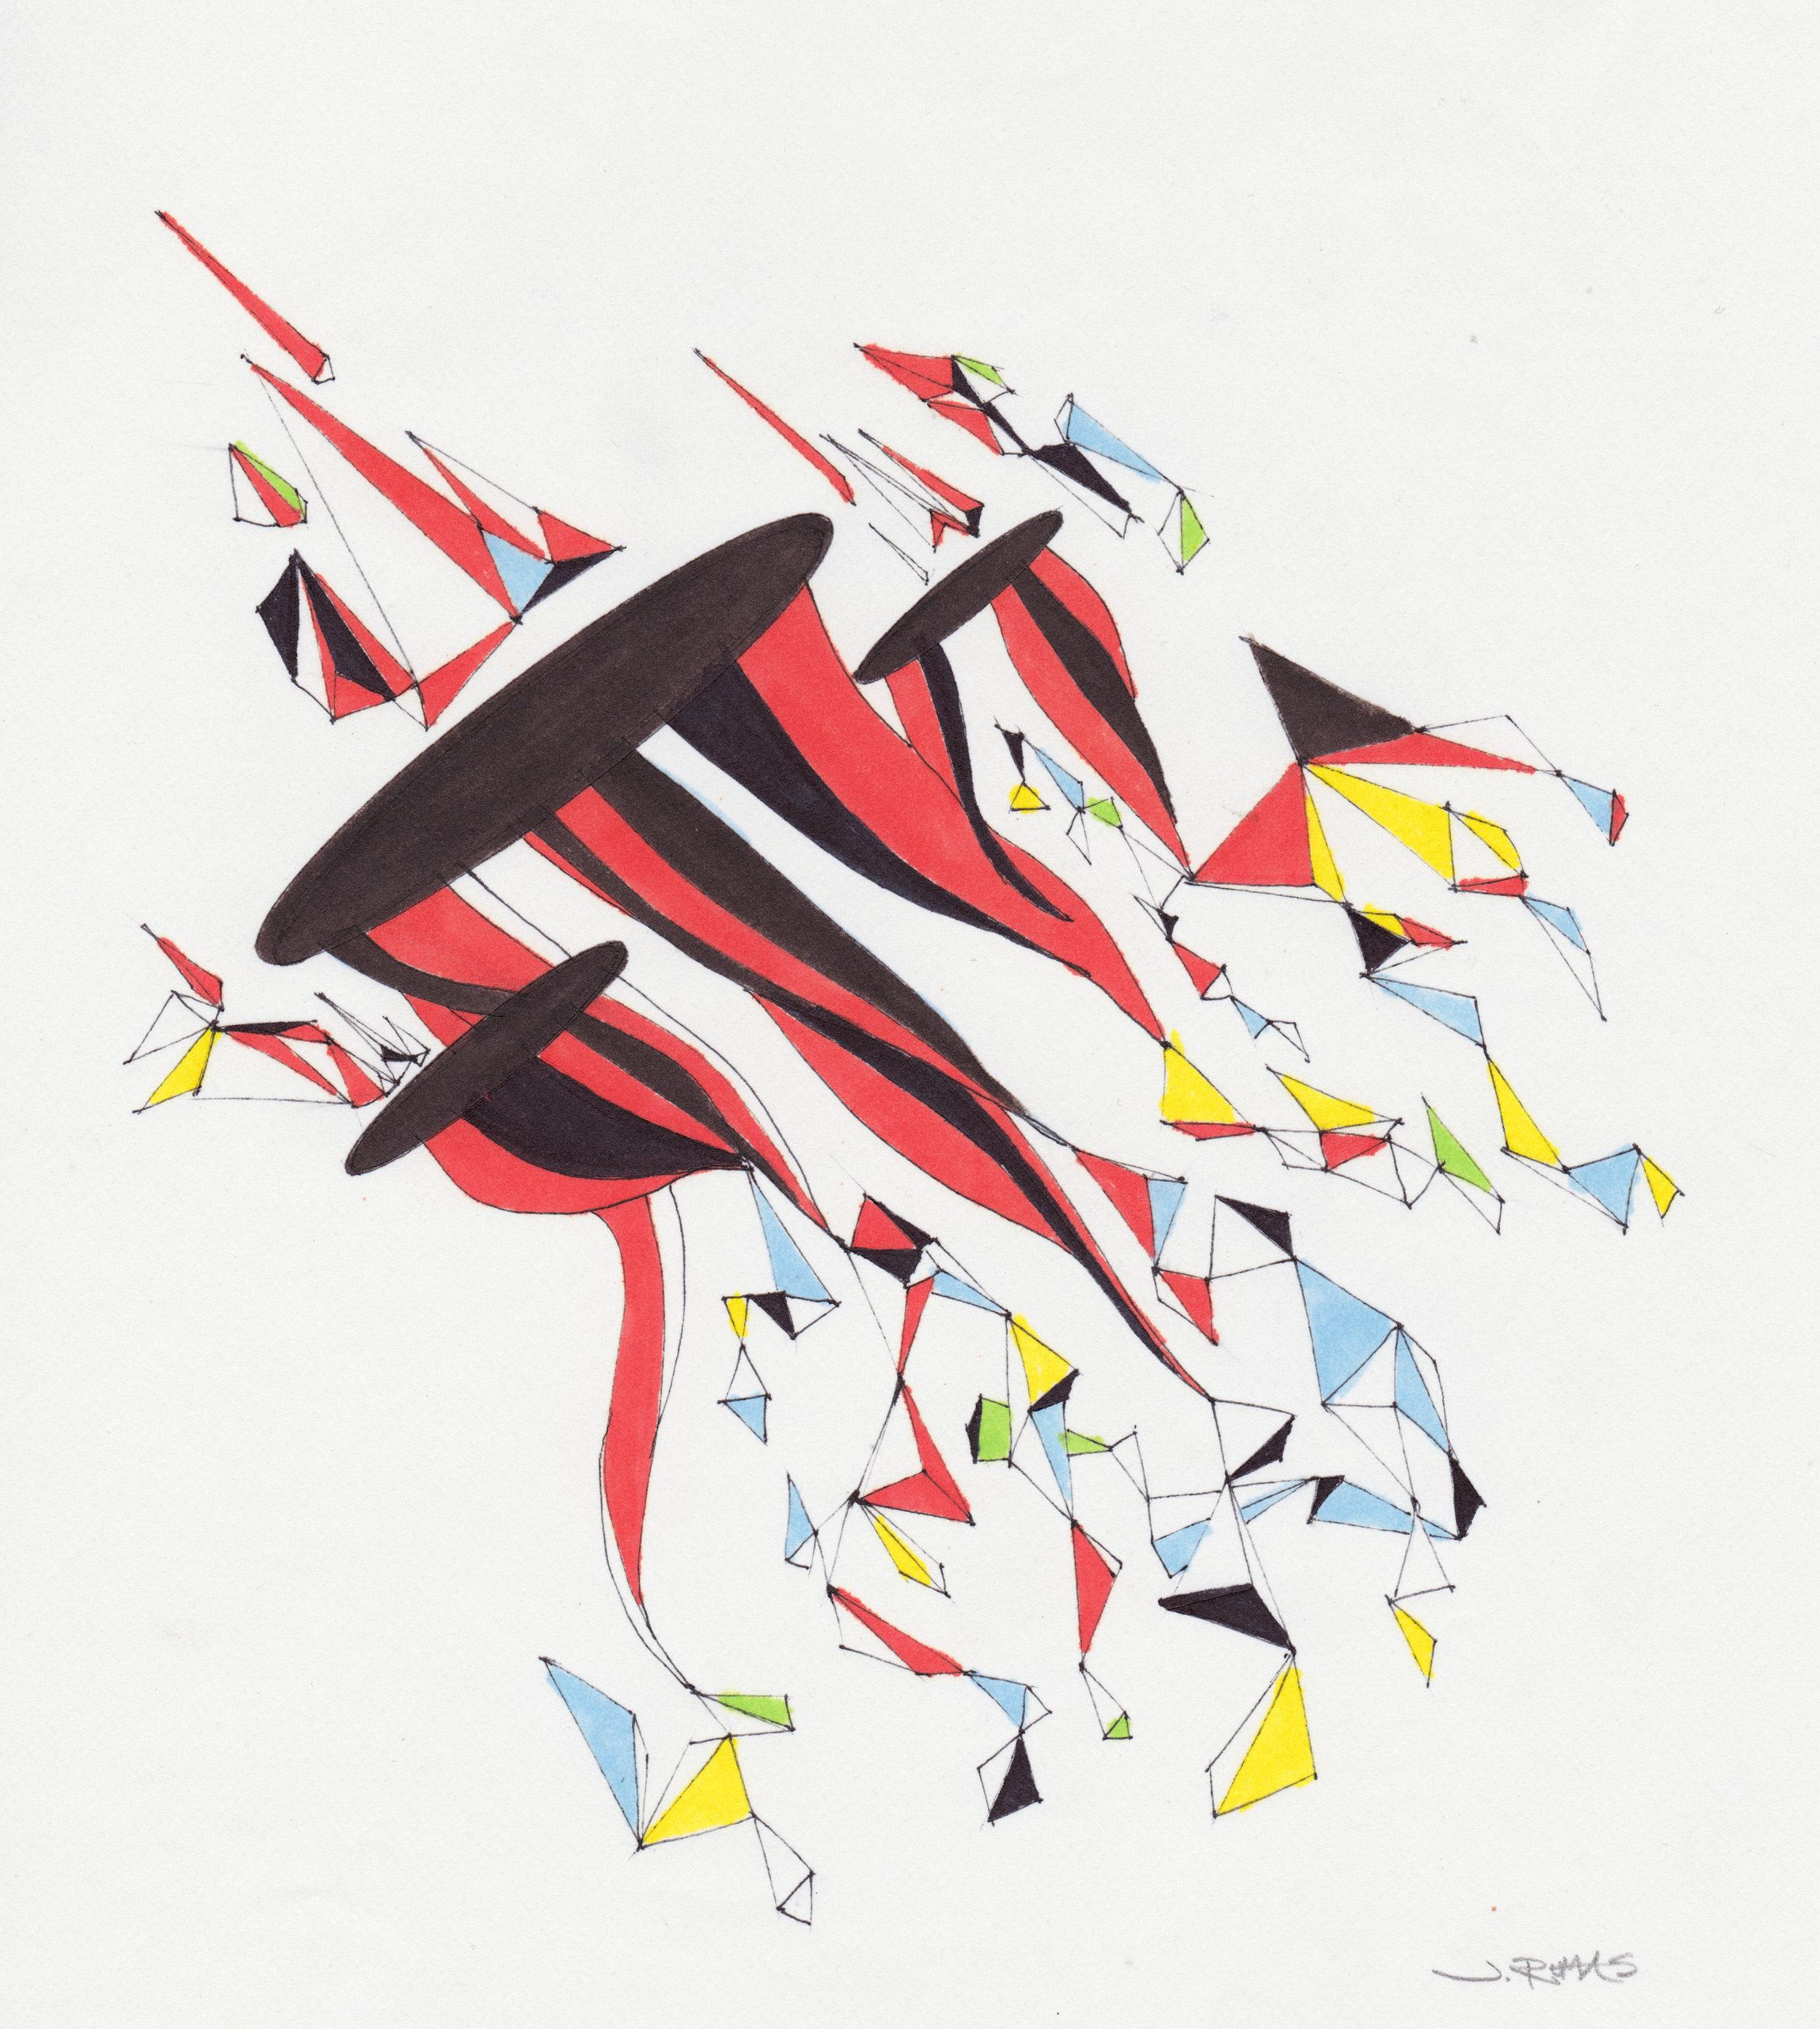 JEREMY RUMAS ART + PEN and MARKER SKETCHES 03 + abstract futurism + modern art +www.jeremyrumas.com.jpeg